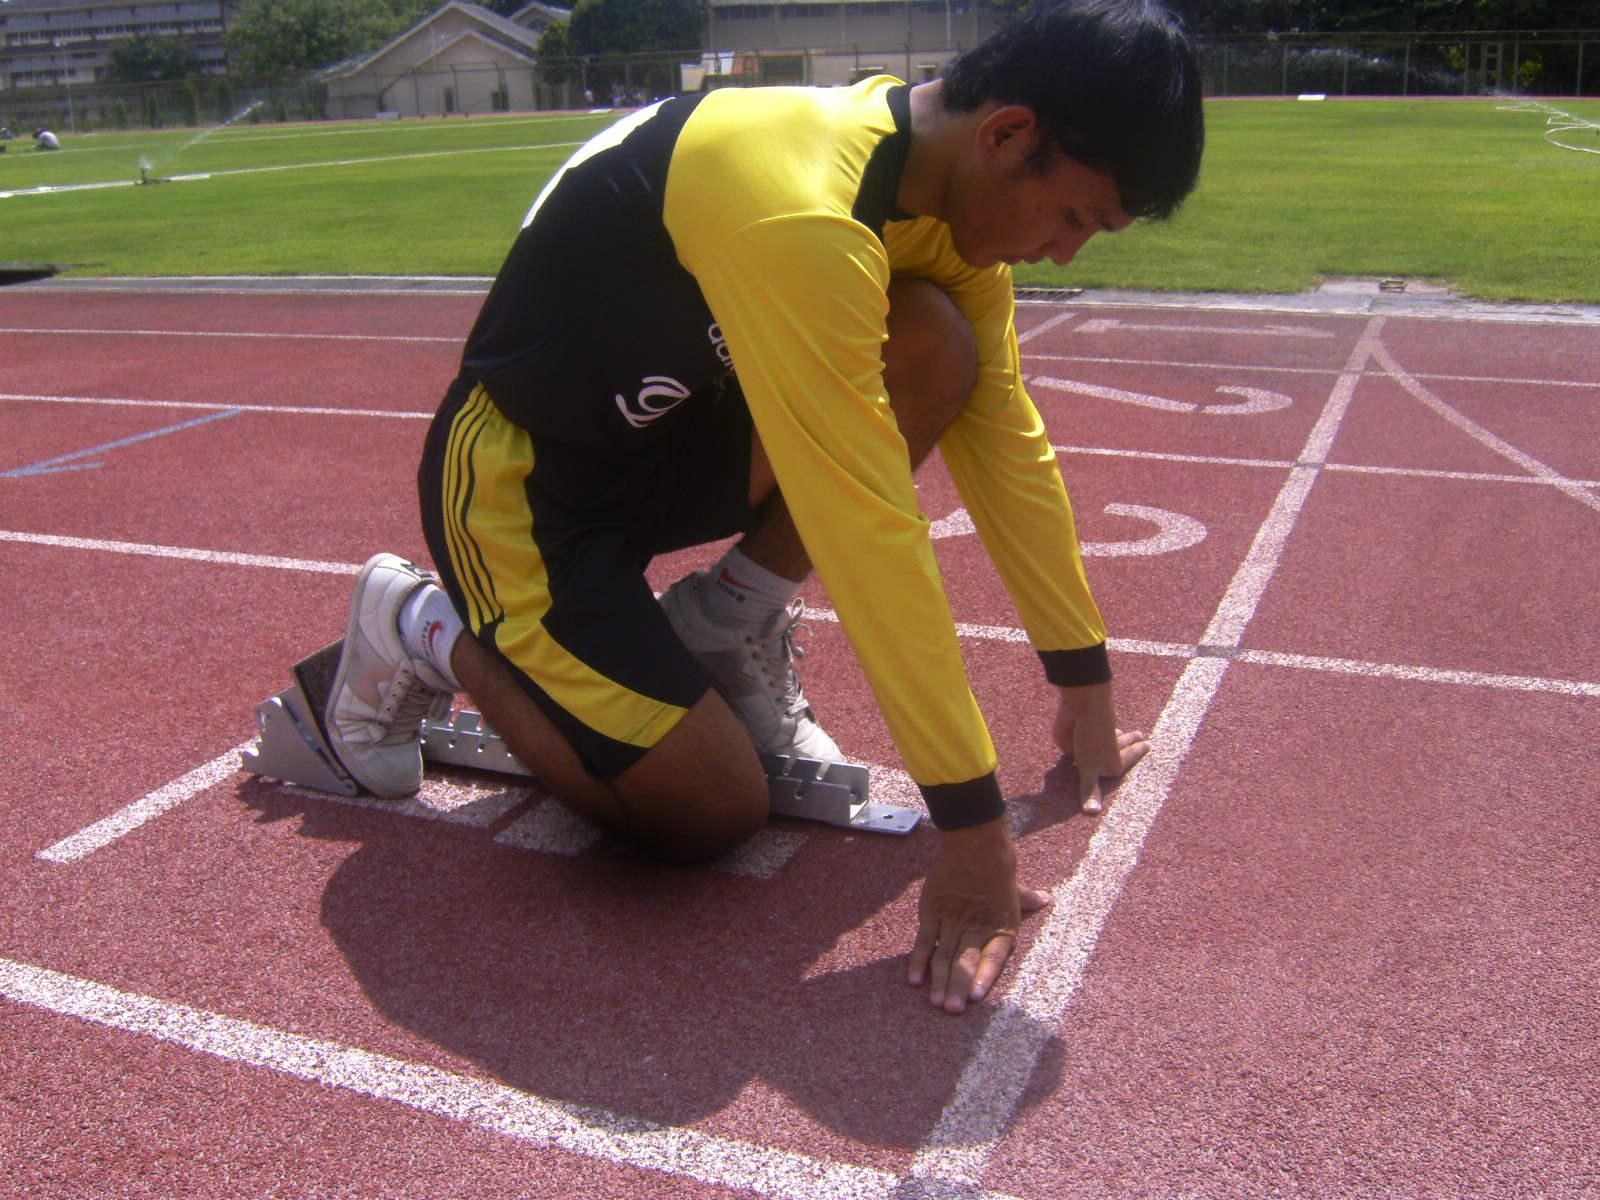 Sikap Start Aba-Aba pada Lari Sprint